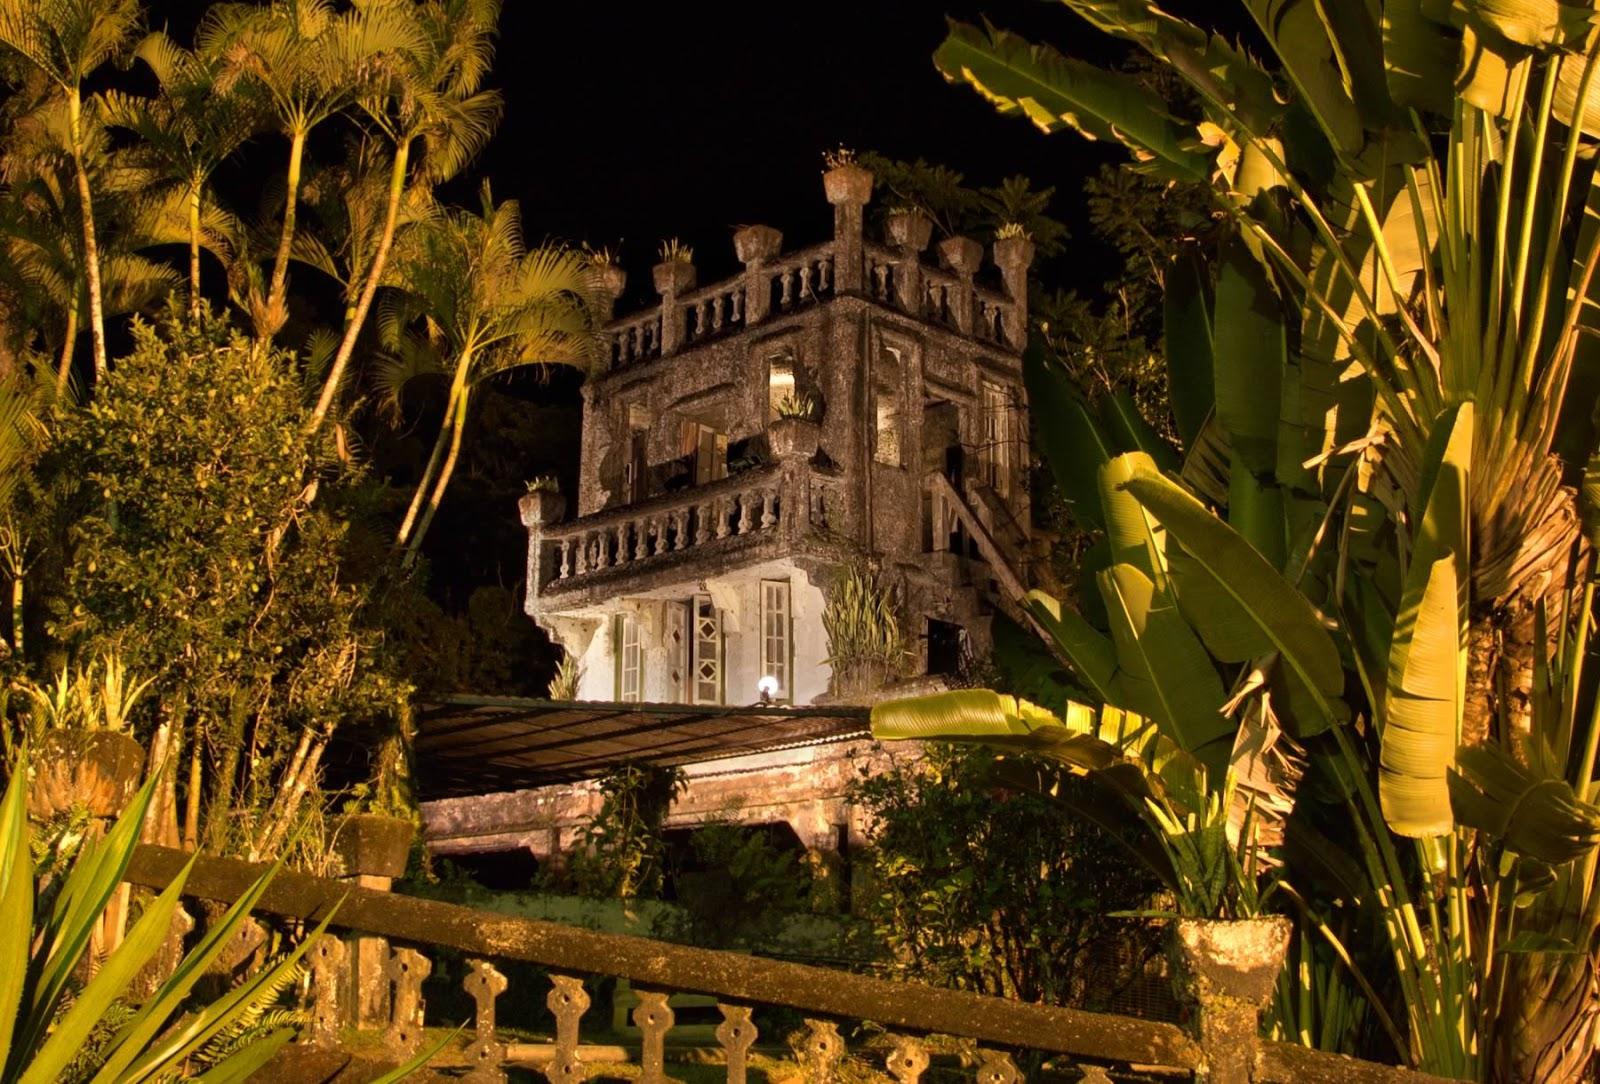 paronalla-top-castle-at-night